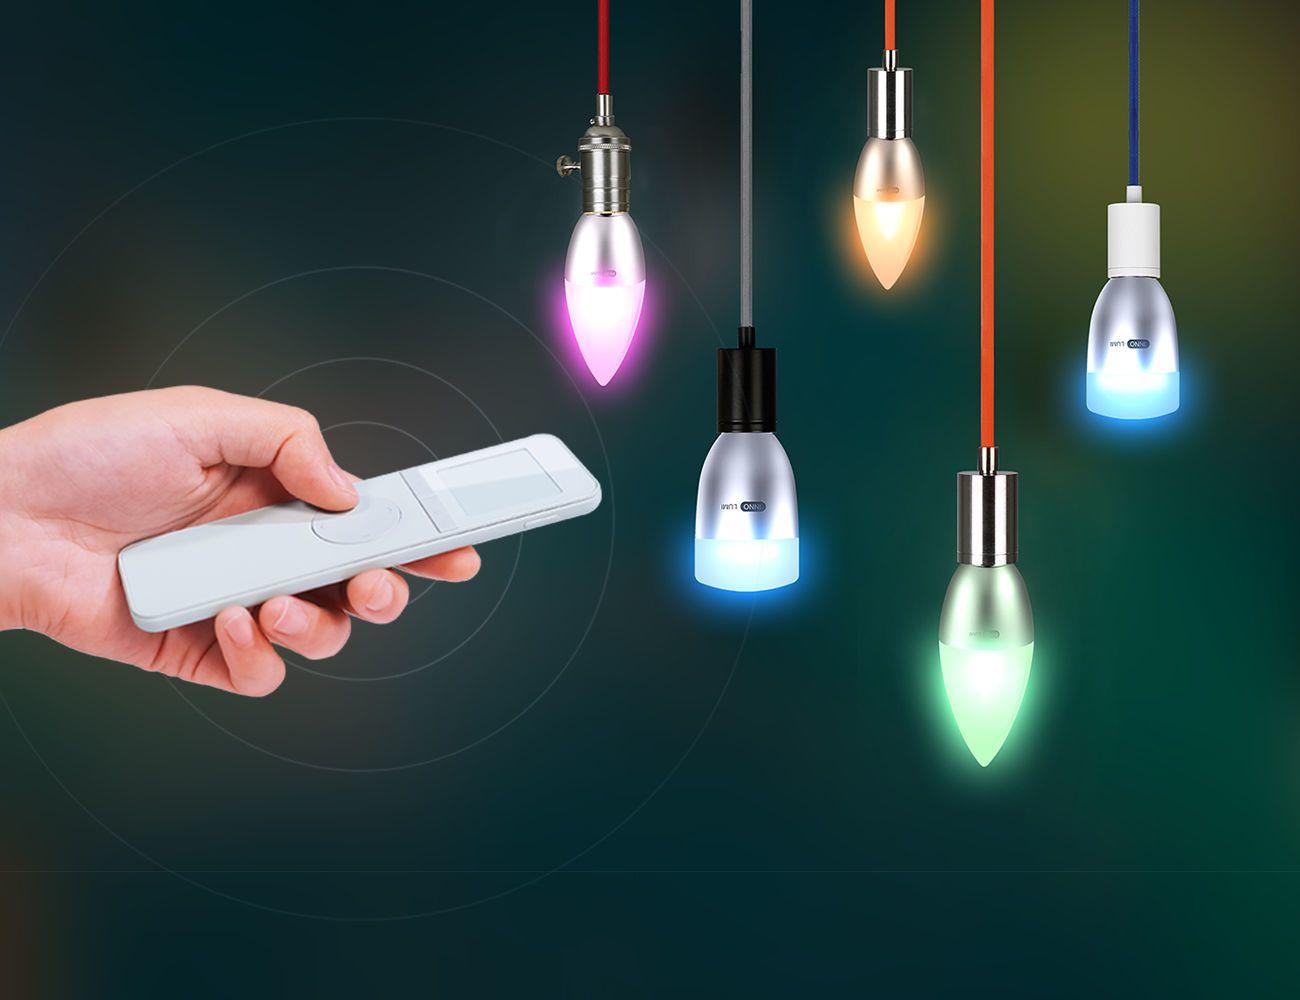 How INNO LUMI Makes Smart Lighting Surprisingly Simple